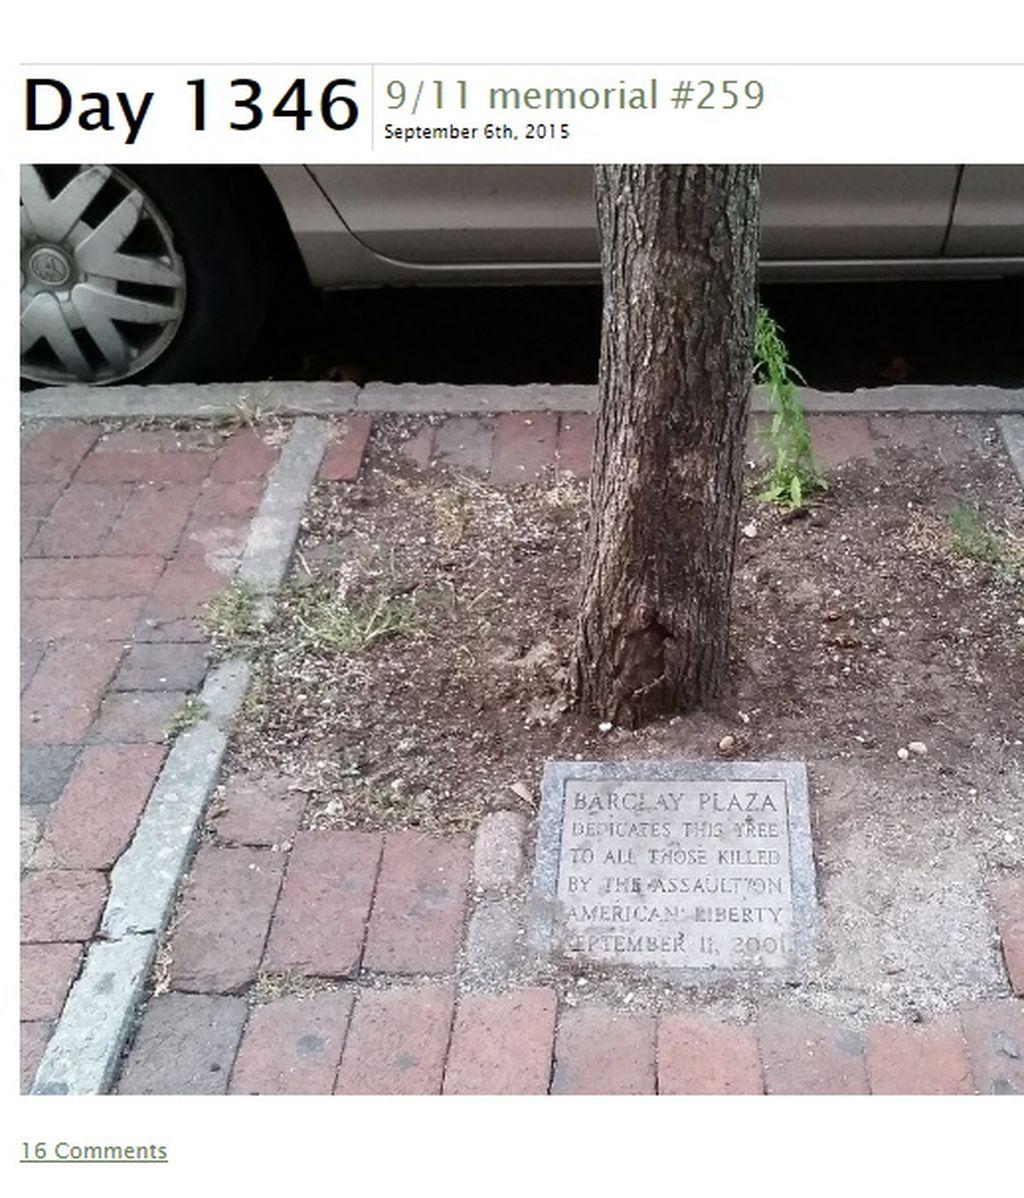 Blog de Matt Green, día 1346